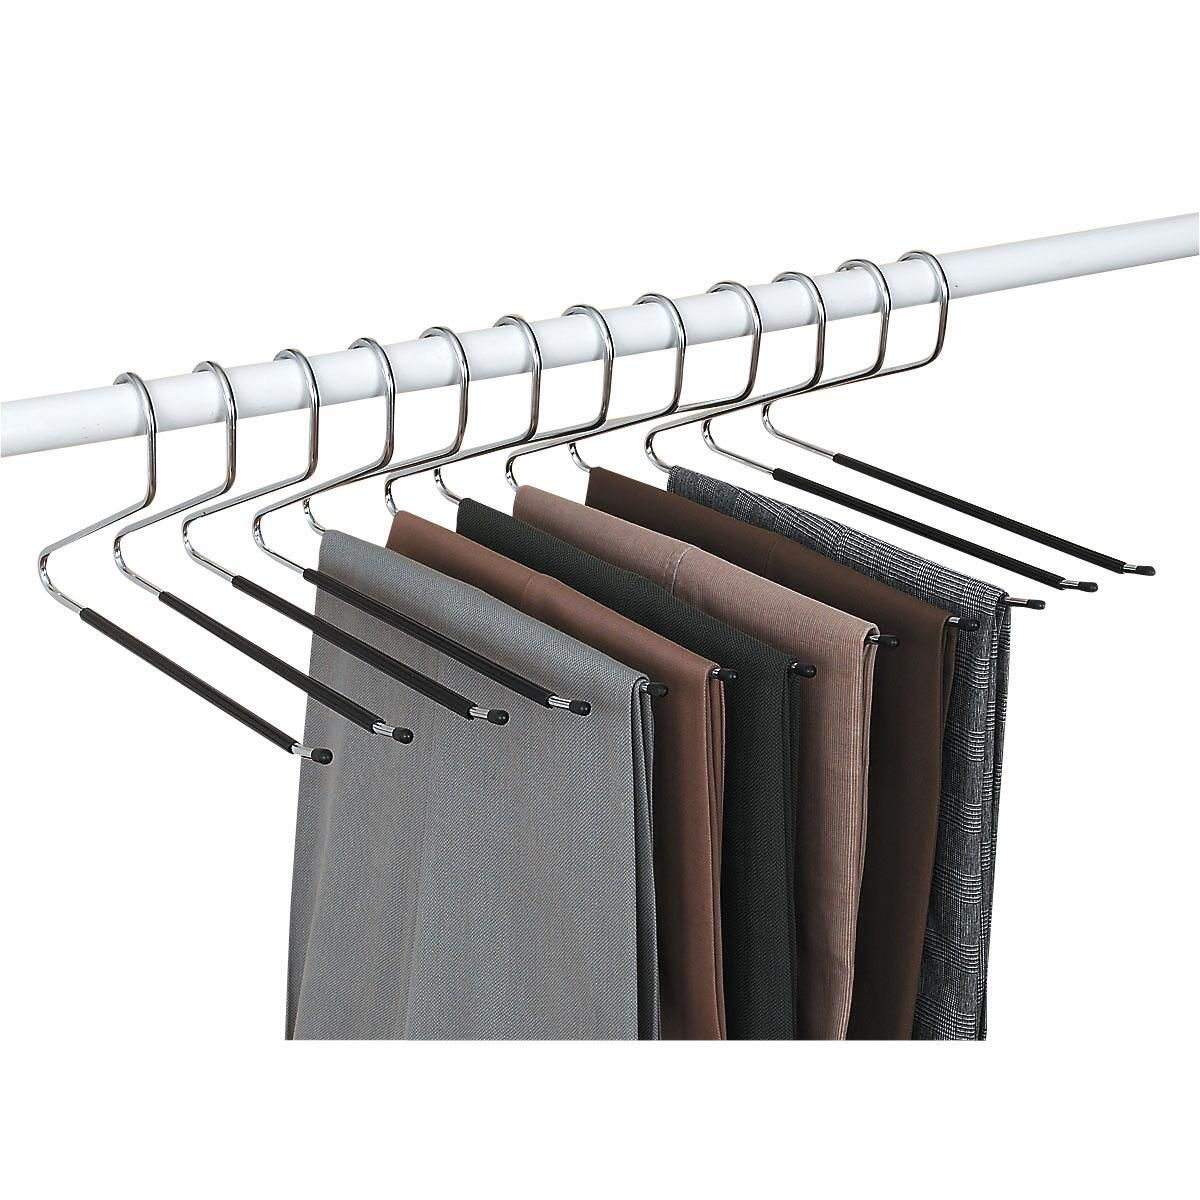 Pants Hangers